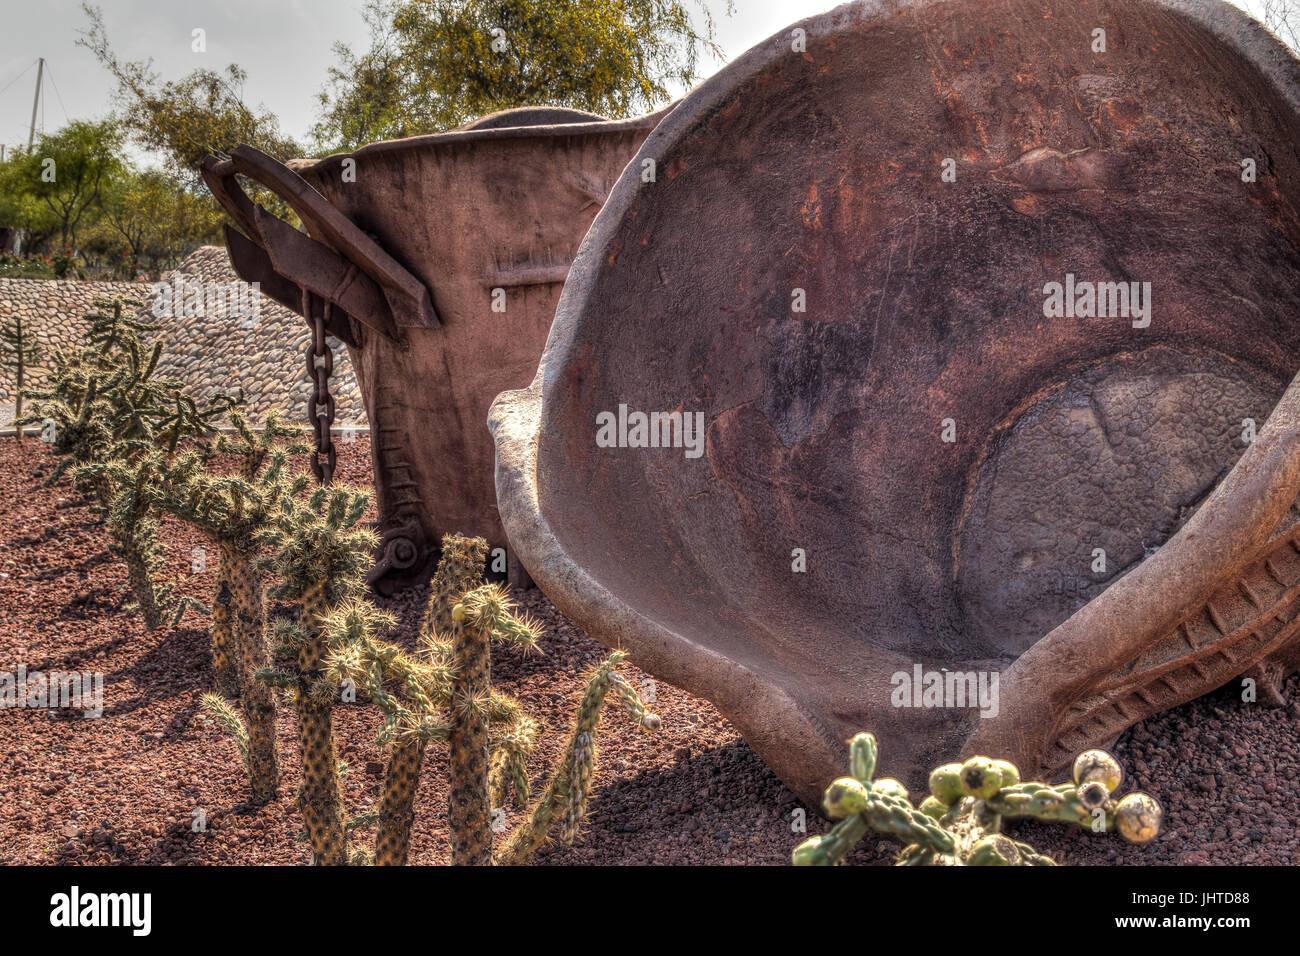 Mining Equipment - Stock Image